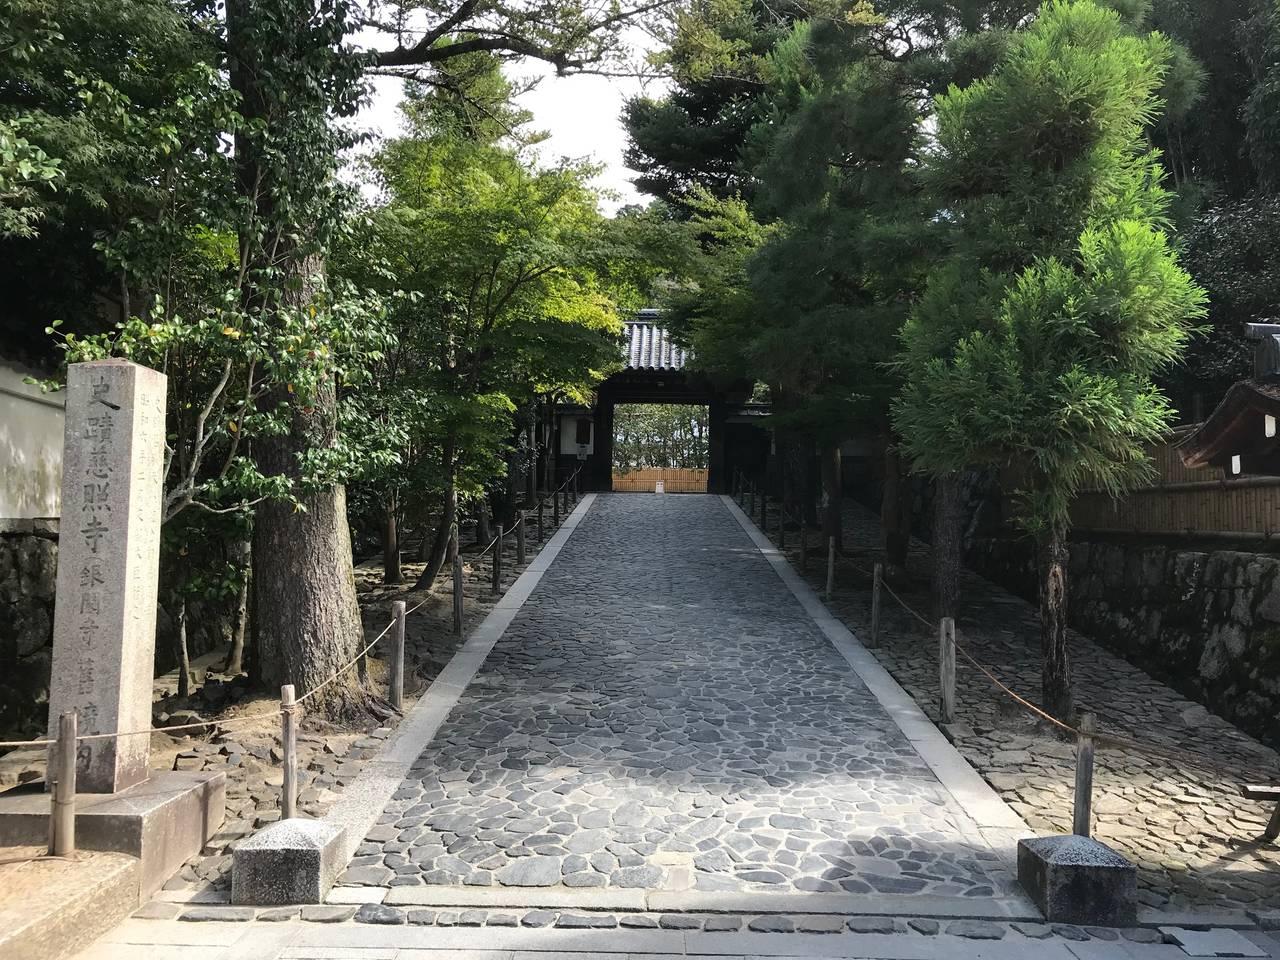 Ginkakuji Temple Entrance